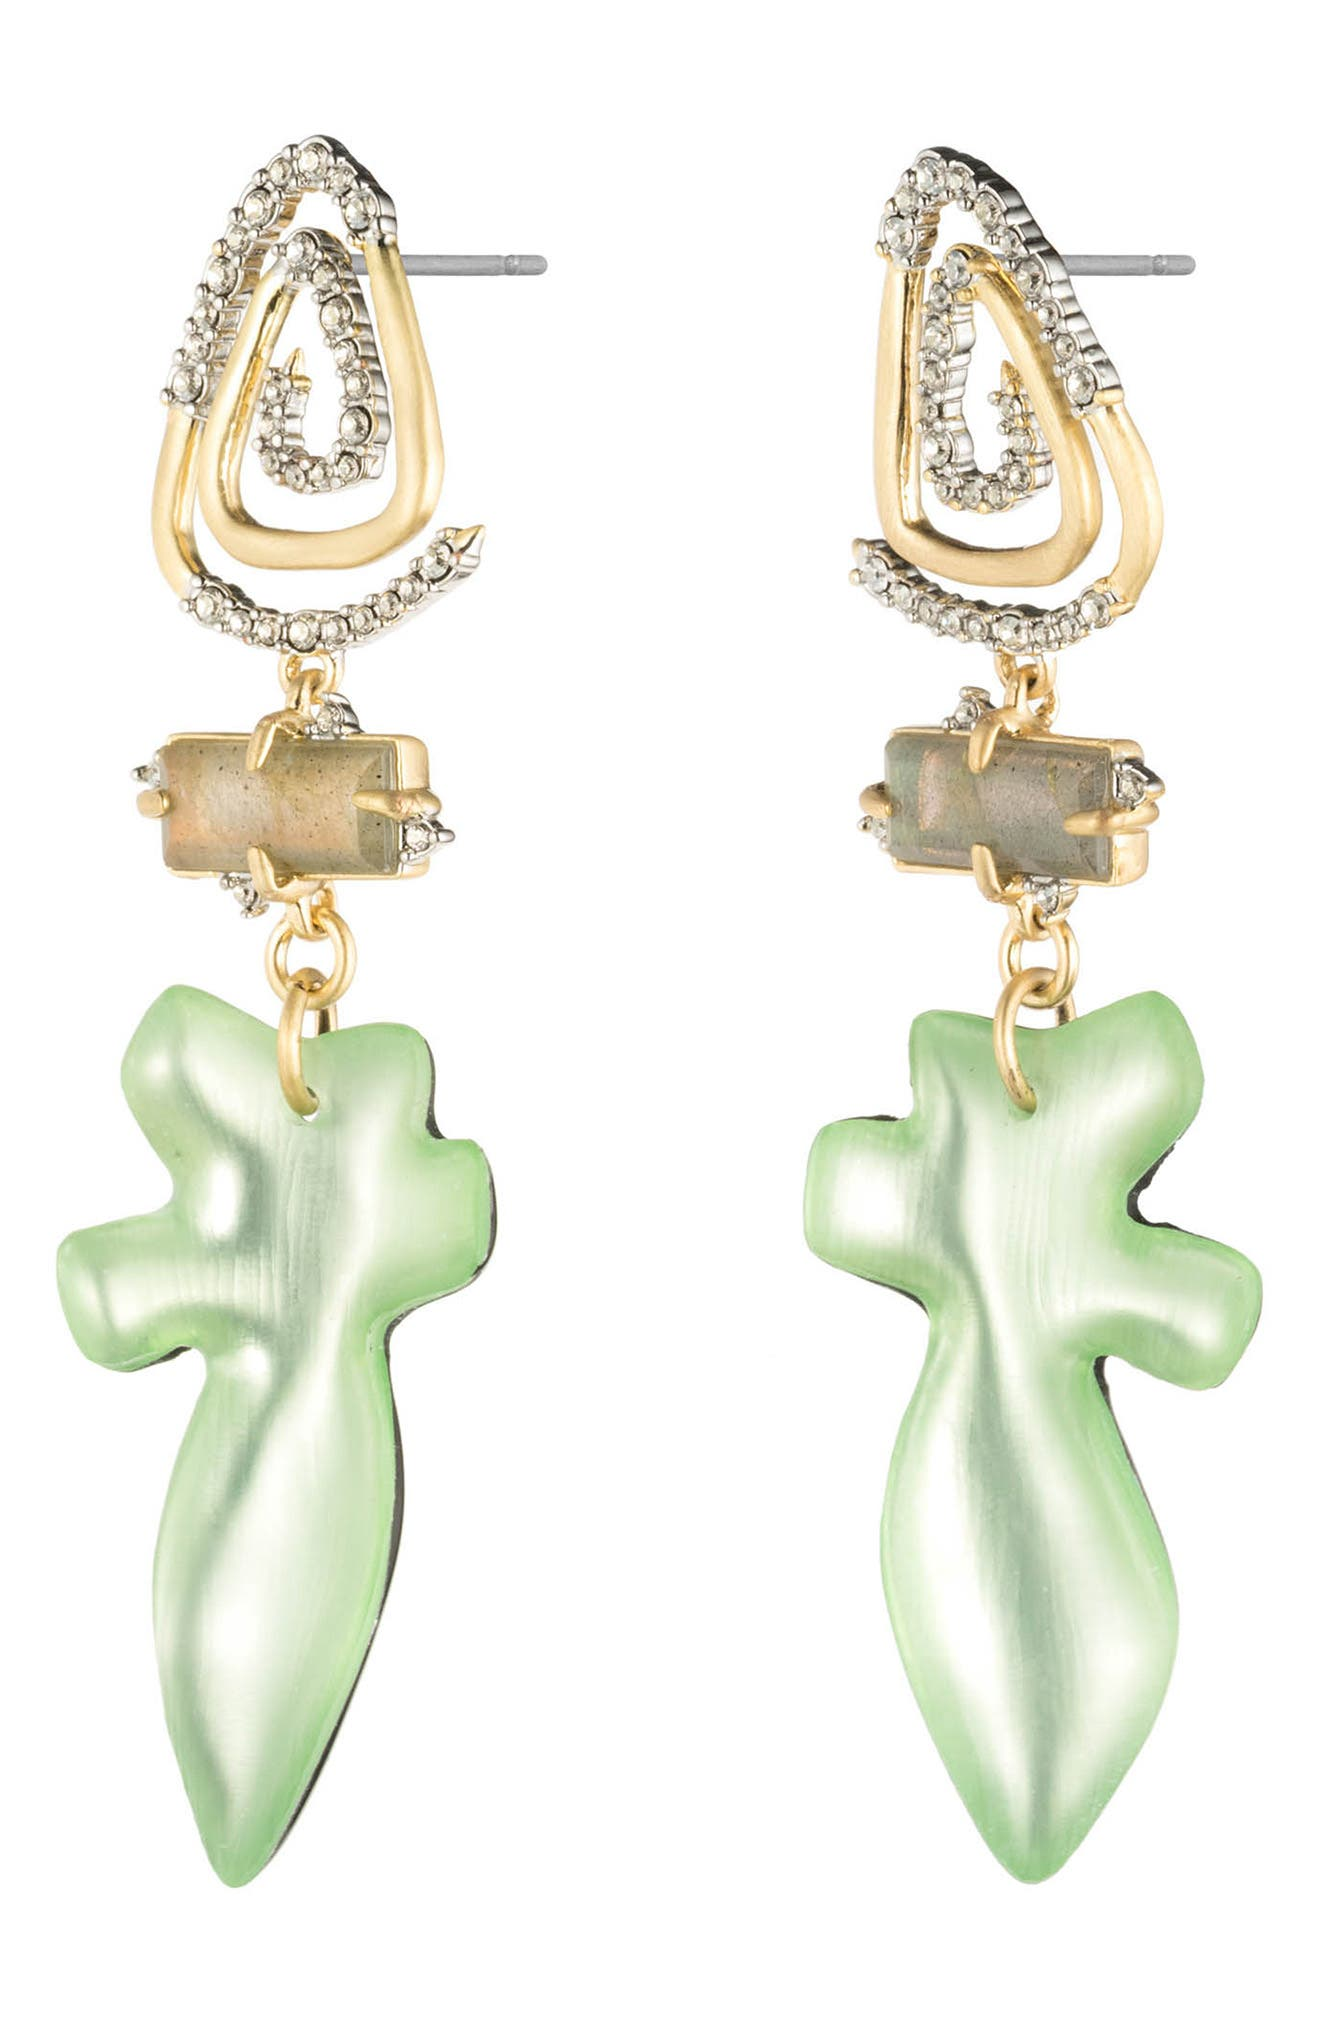 Crystal Encrusted Spiral Post Earrings,                             Alternate thumbnail 2, color,                             SEAFOAM